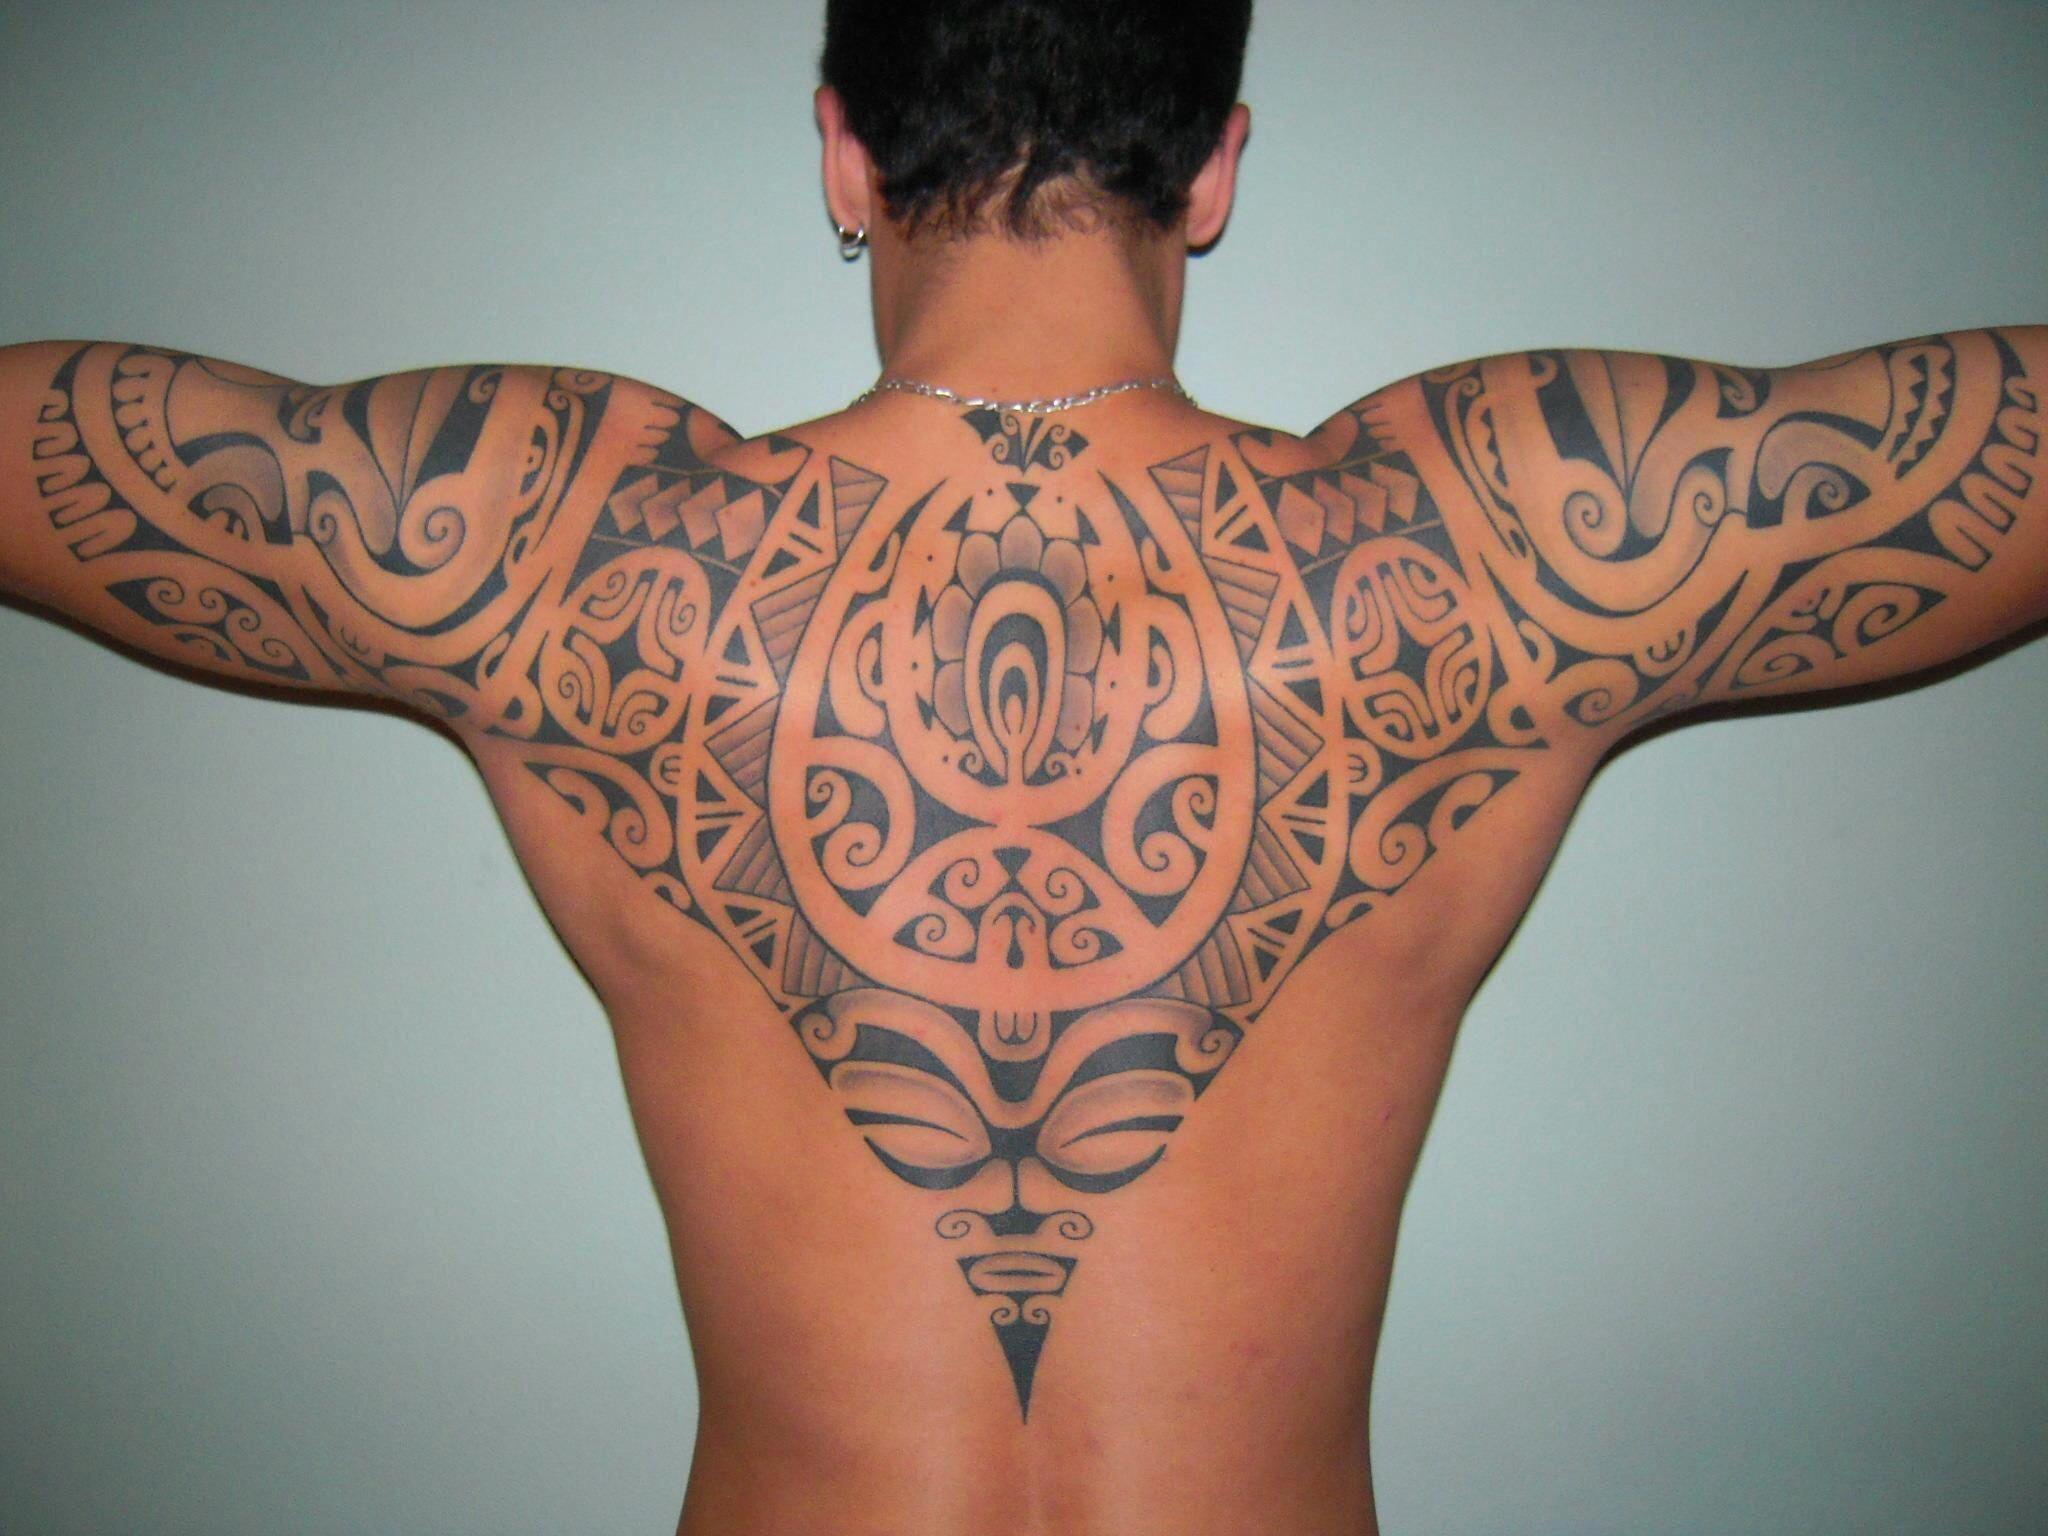 Grooming Tattoo Maoritattoos Tetovalas Polynesian